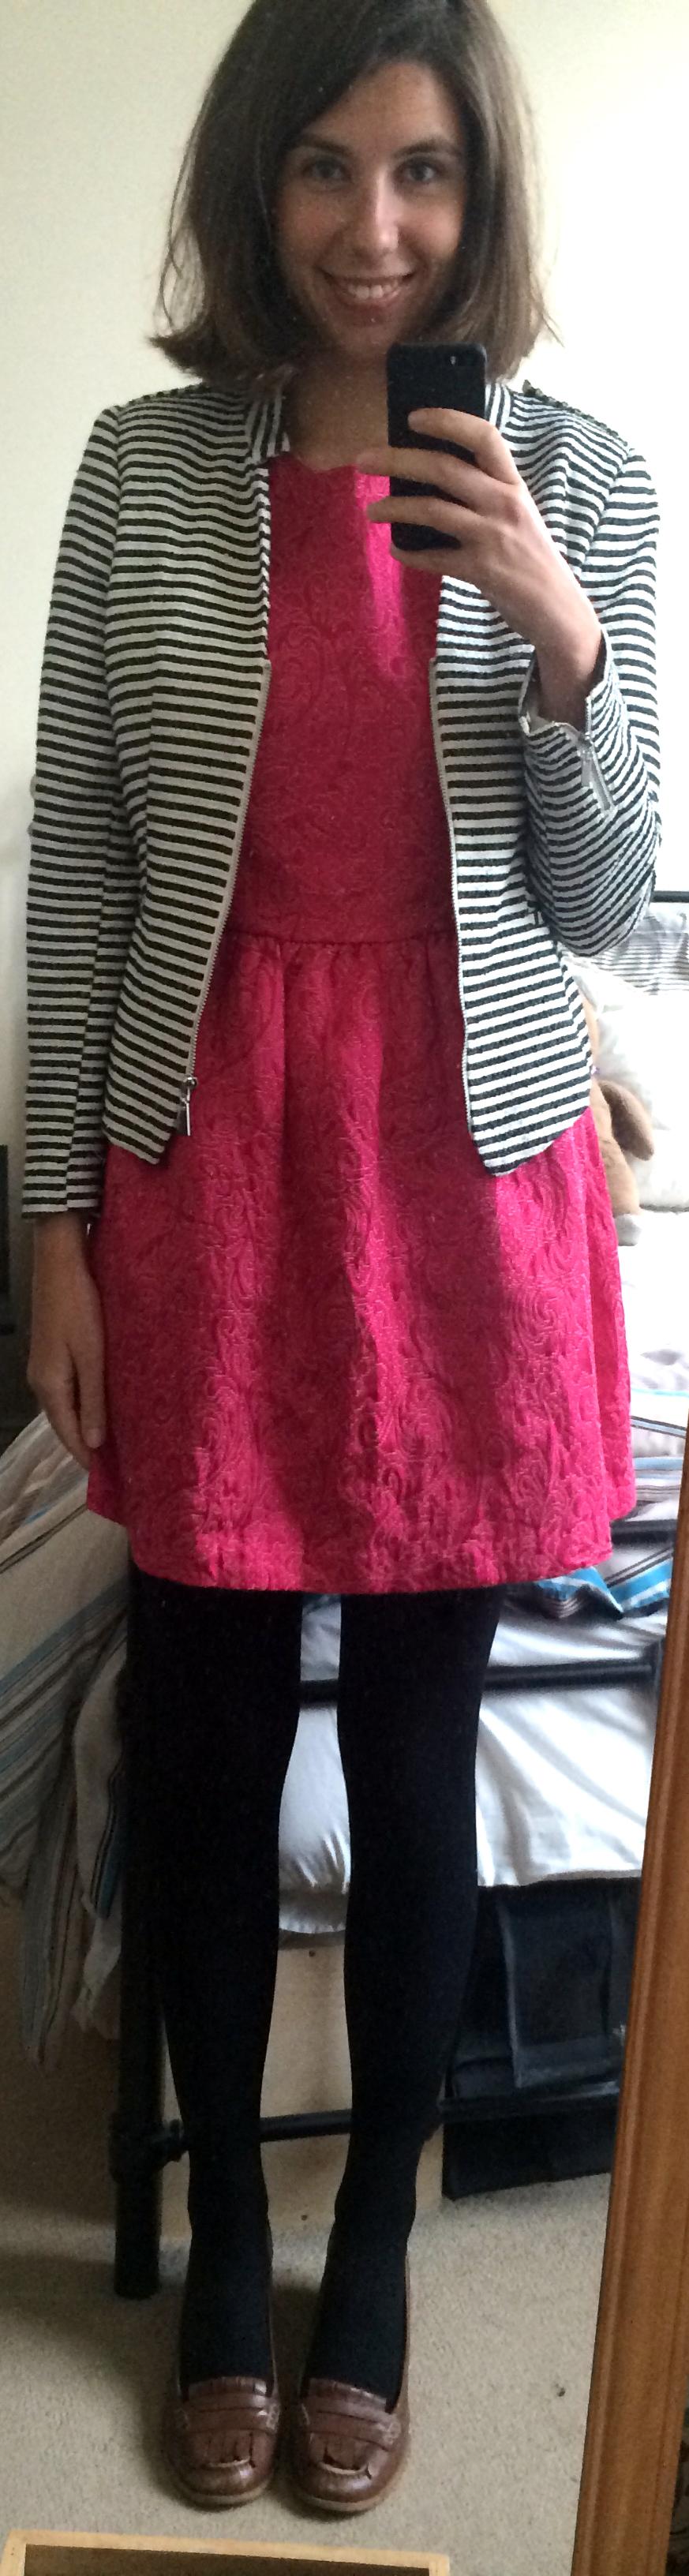 Striped Jacket ,  Pink Shift Dress Dress ,  Brown Heeled Loafers